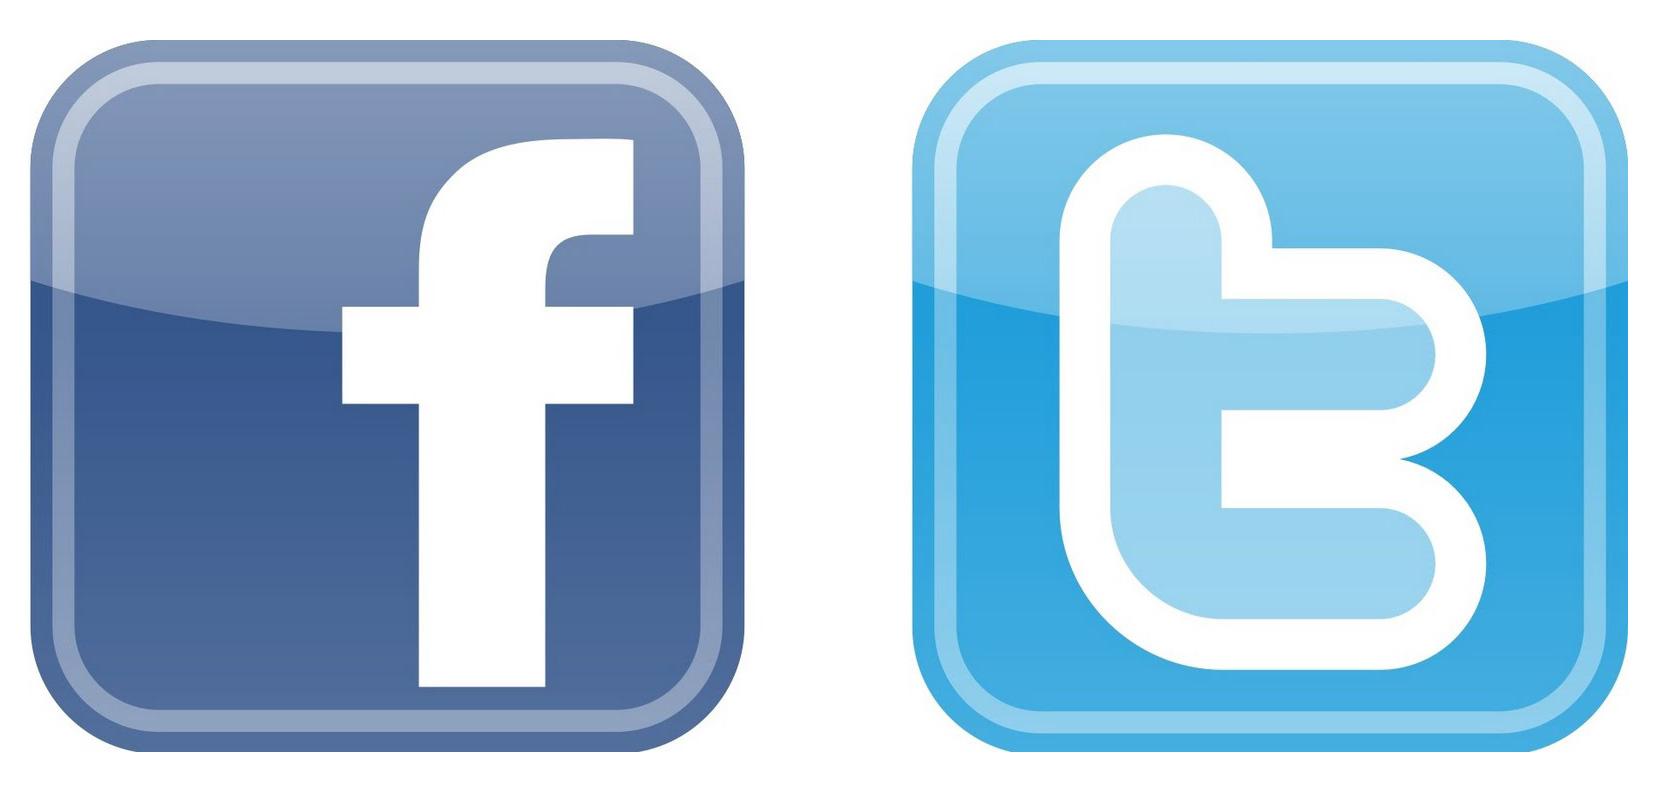 Clip art facebook vector transparent download Facebook clipart download - ClipartFest vector transparent download